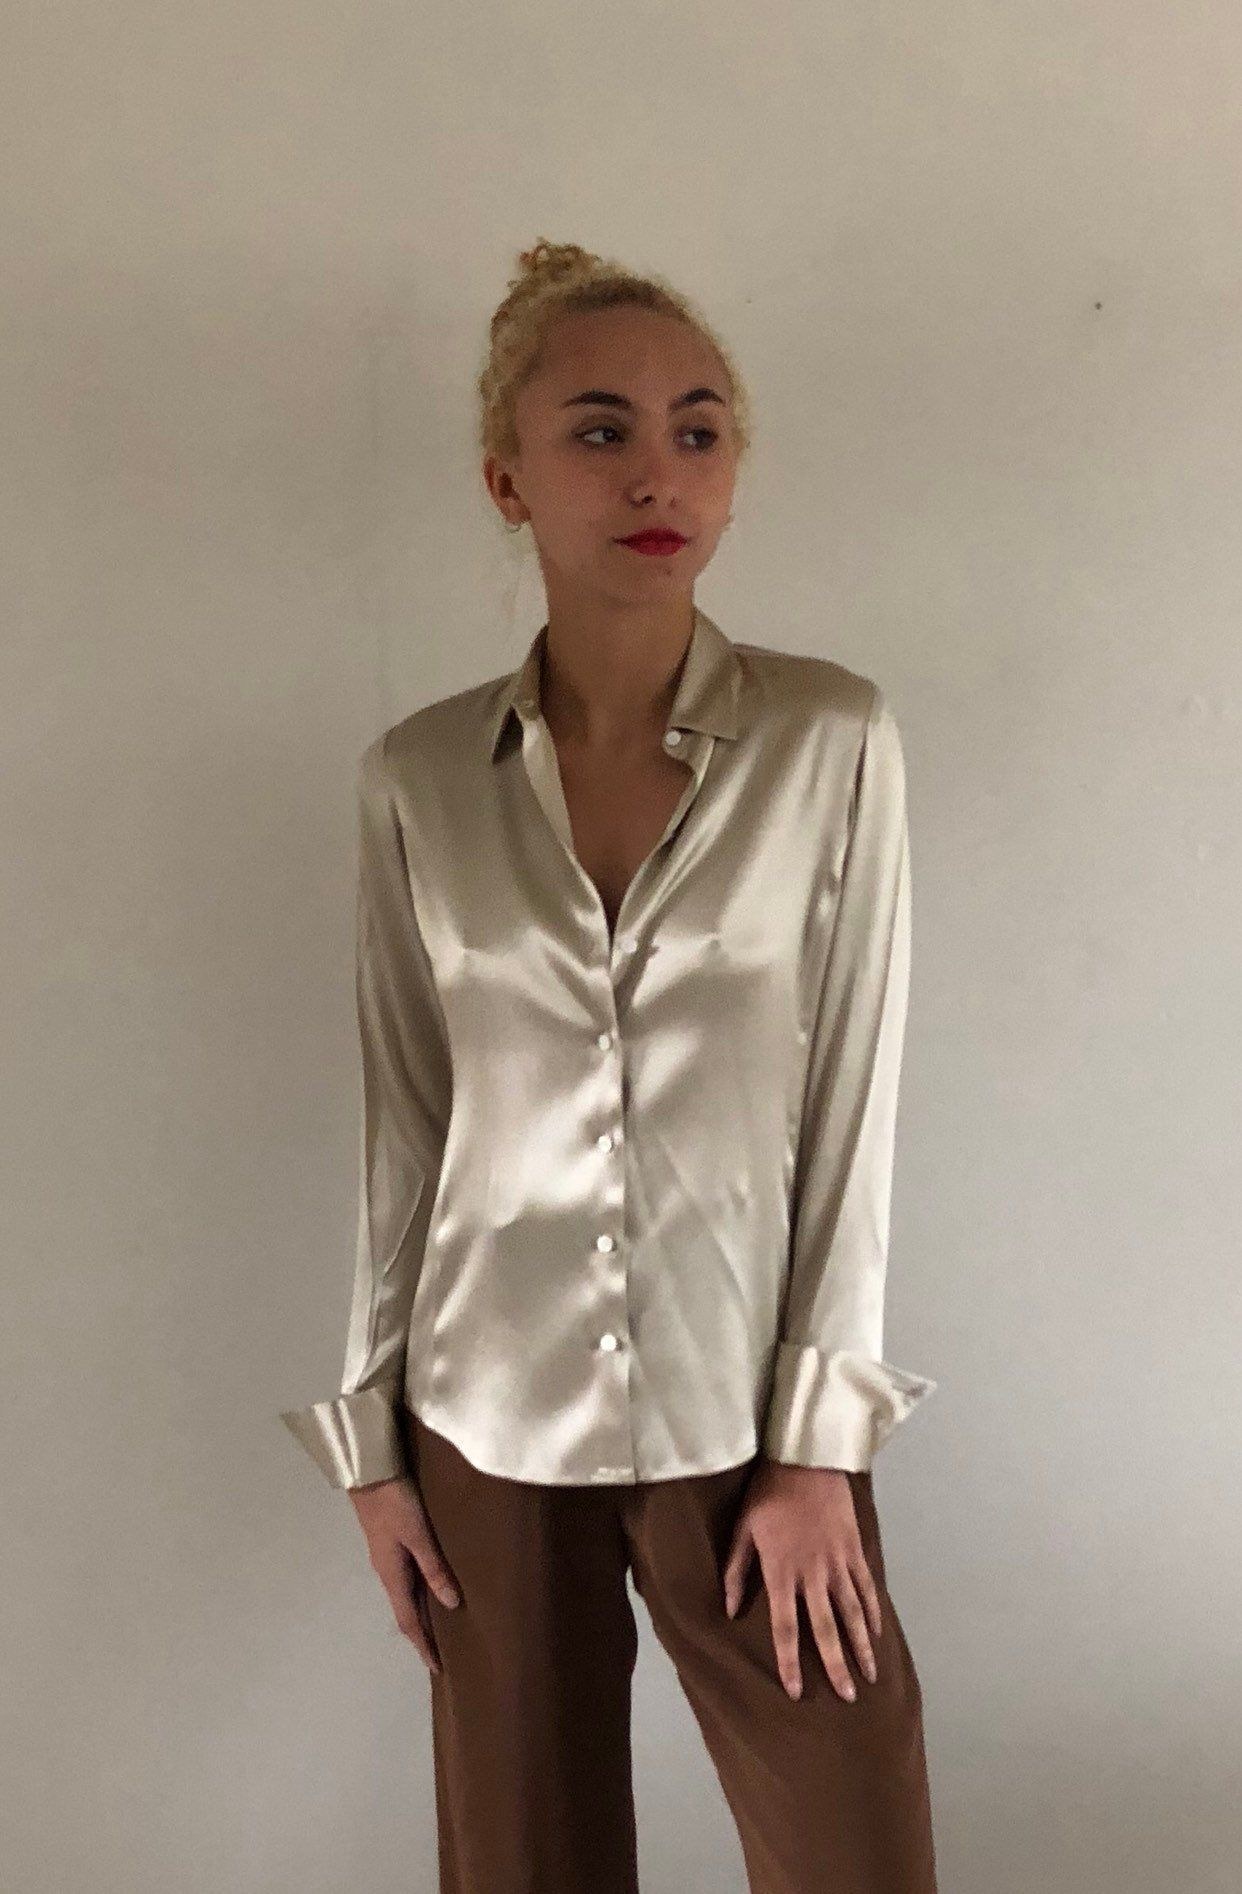 bab377a1249cce 90s silk charmeuse blouse champagne silk button down shirt ...